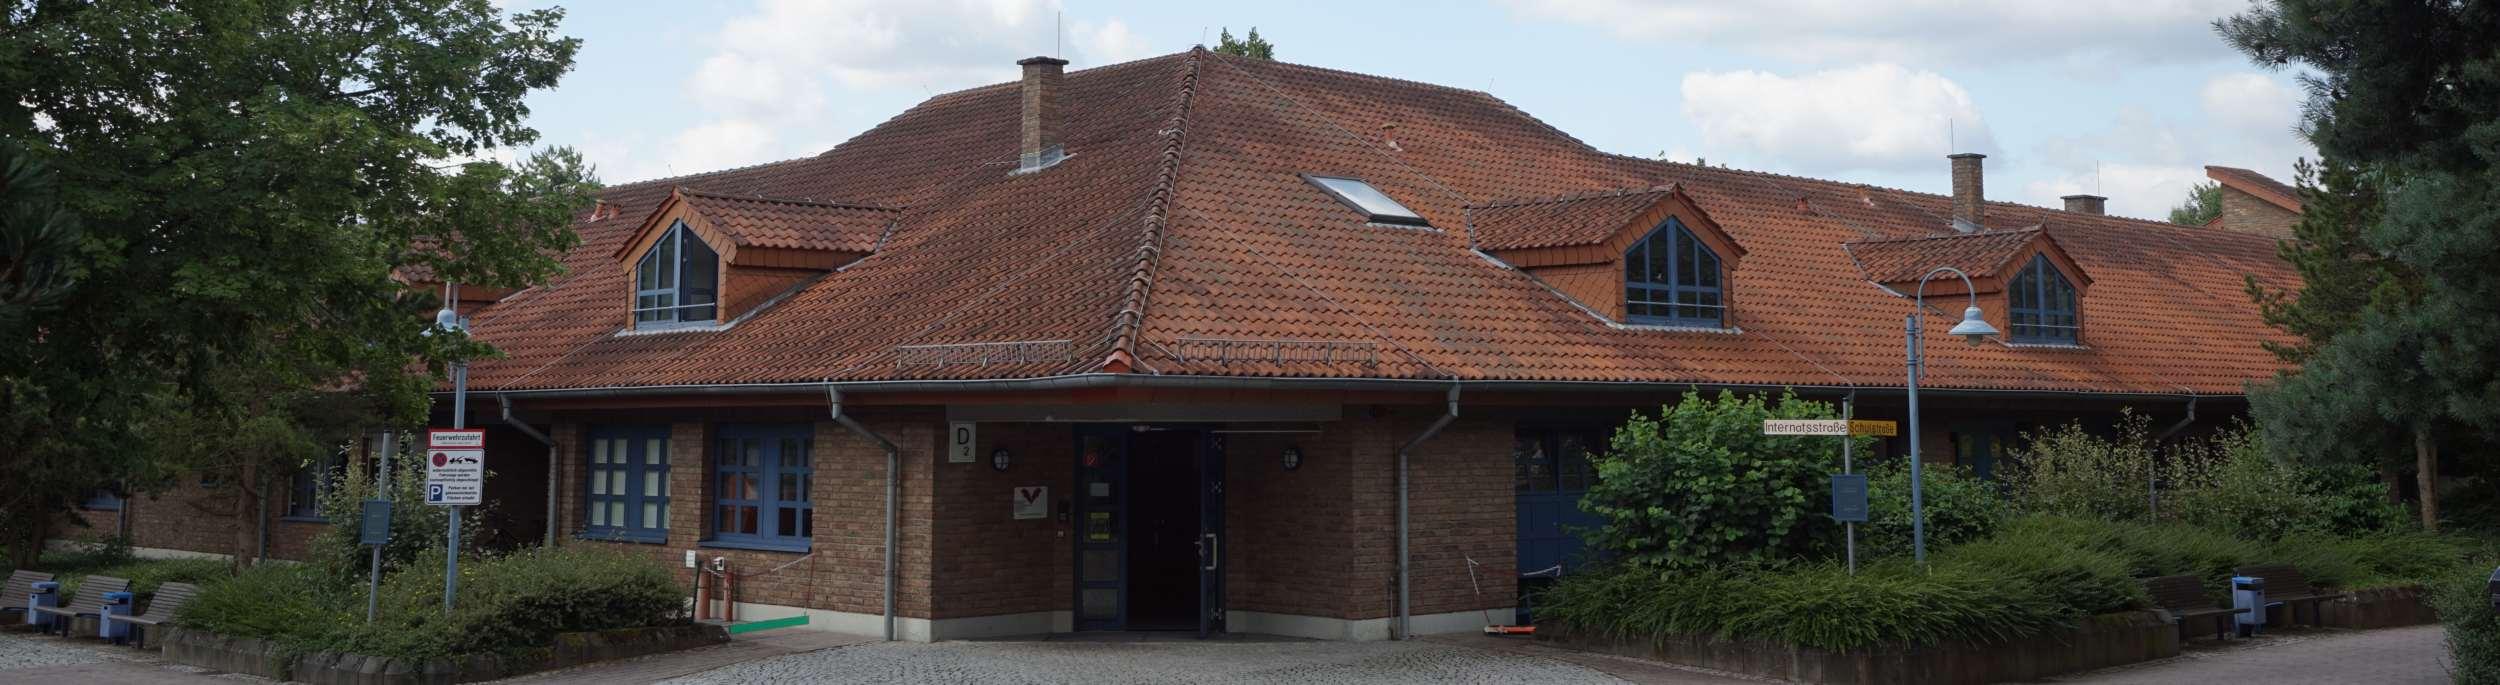 start_pausenhof_schule